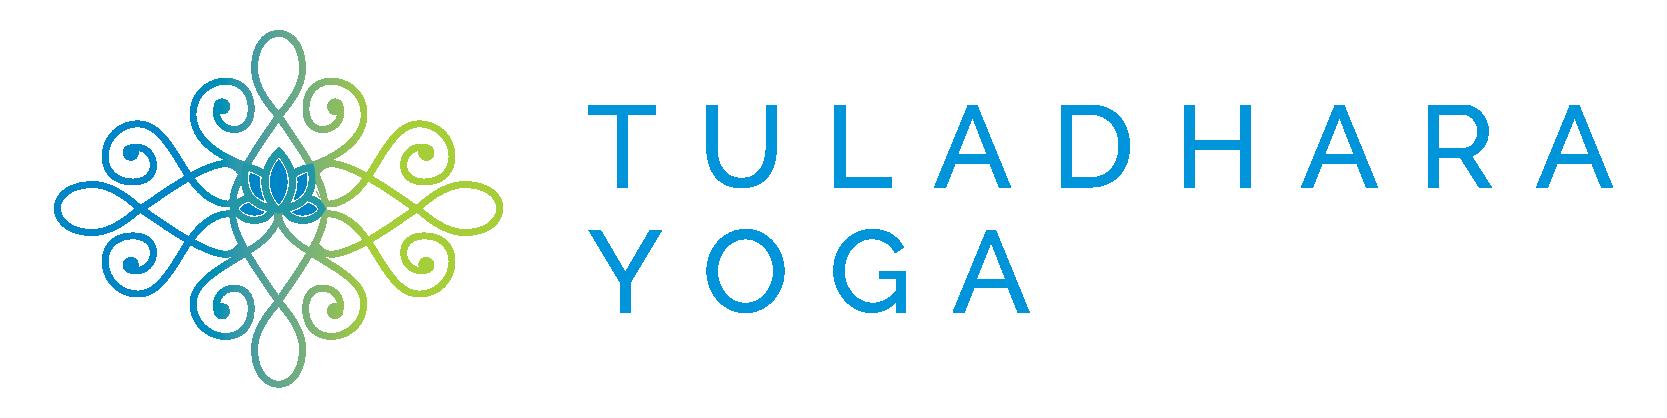 Tuladhara Yoga